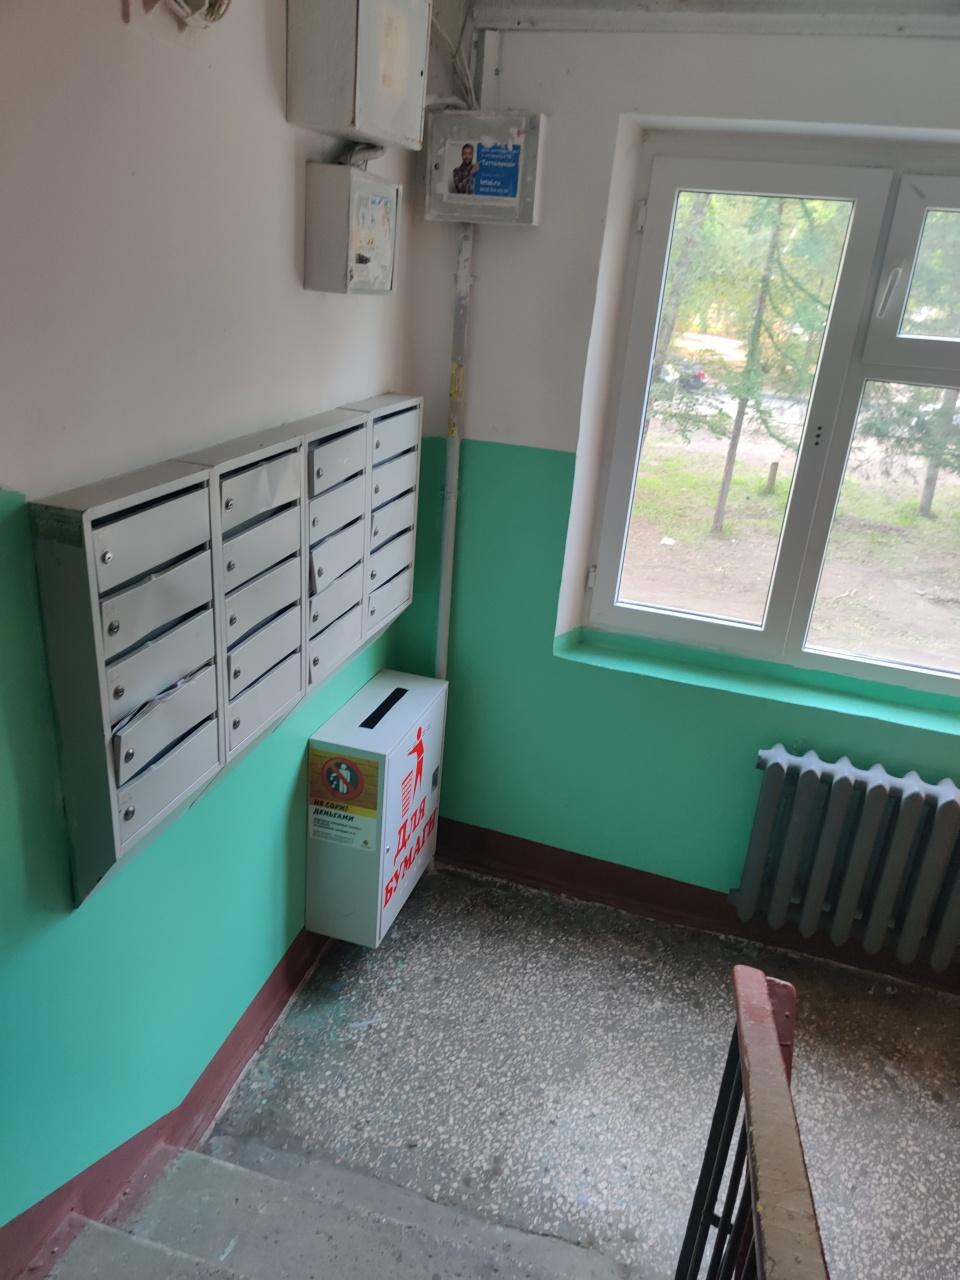 Продам двухкомнатную (2-комн.) квартиру, Маршала Чуйкова ул, 26, Казань г